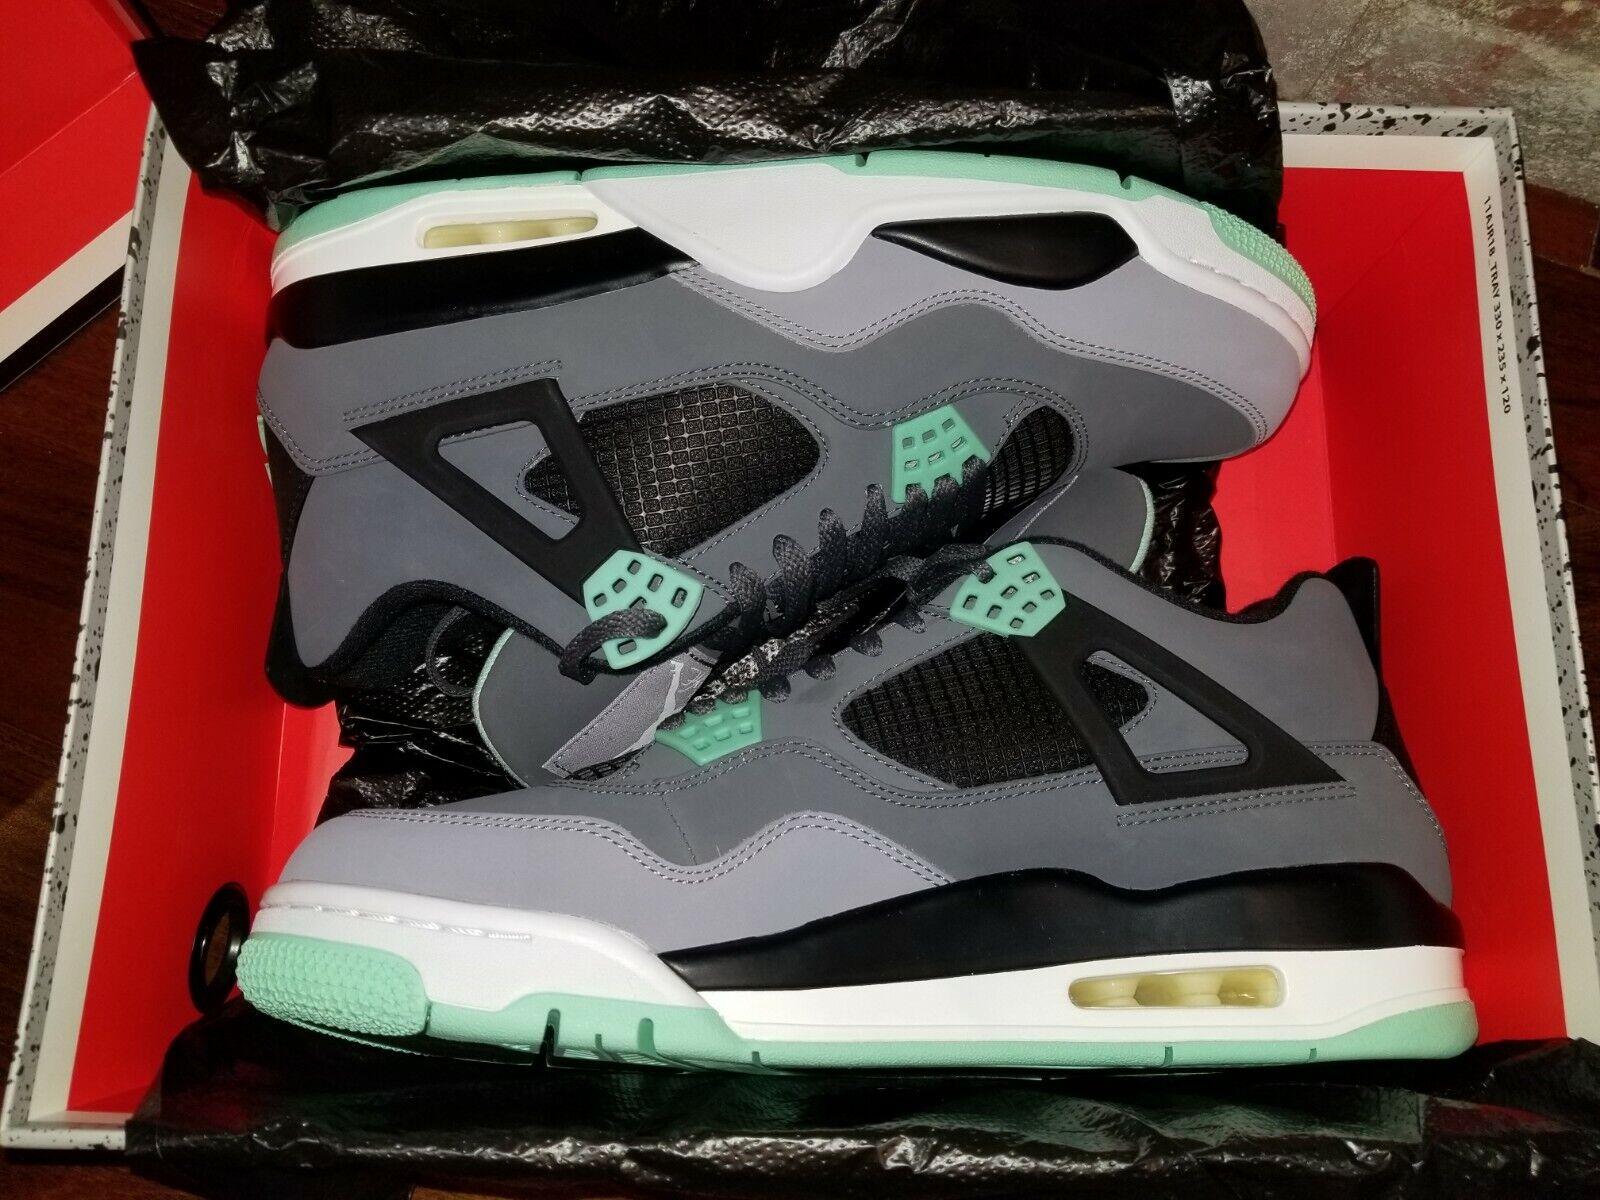 NIKE Air Jordan 4 IV RETRO OG GREEN GLOW sz 10.5 NIB+ foot lockr rcpt 308497 033